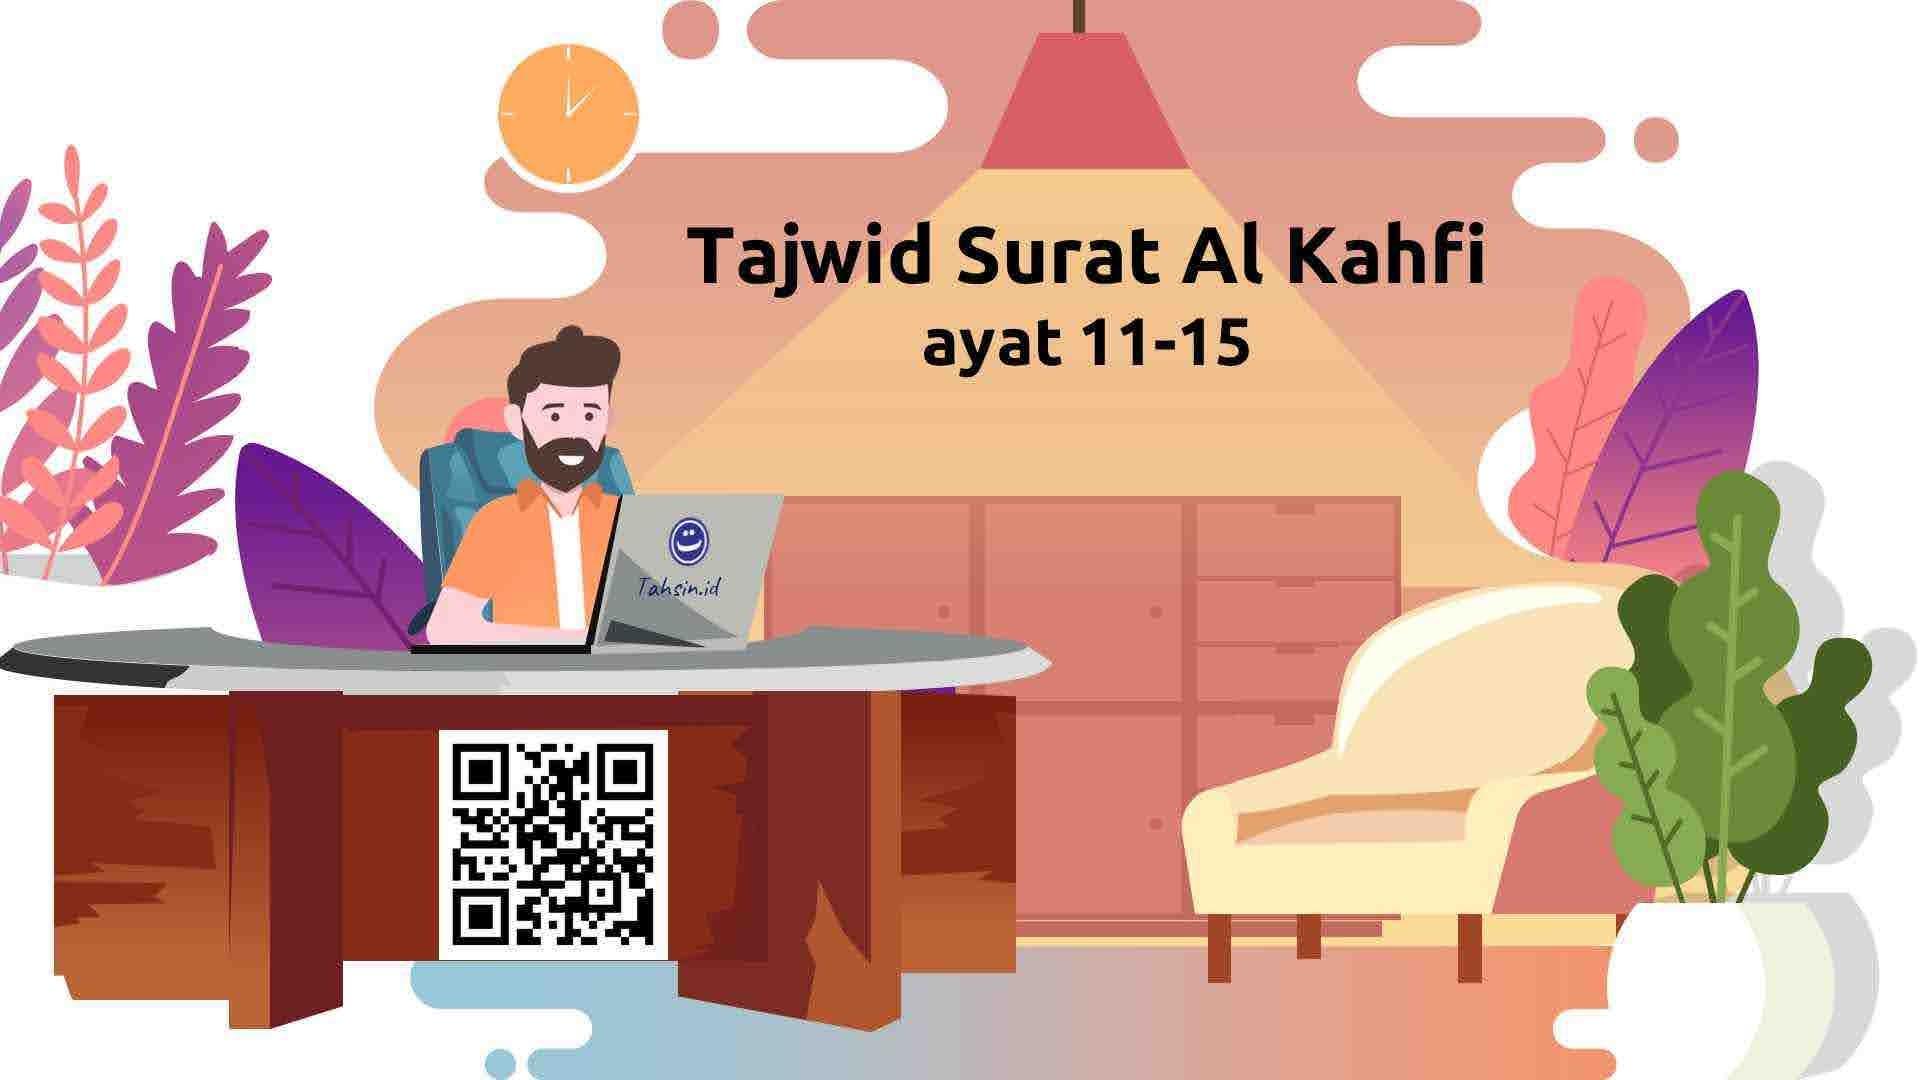 tajwid-surat-al-kahfi-ayat-11-15